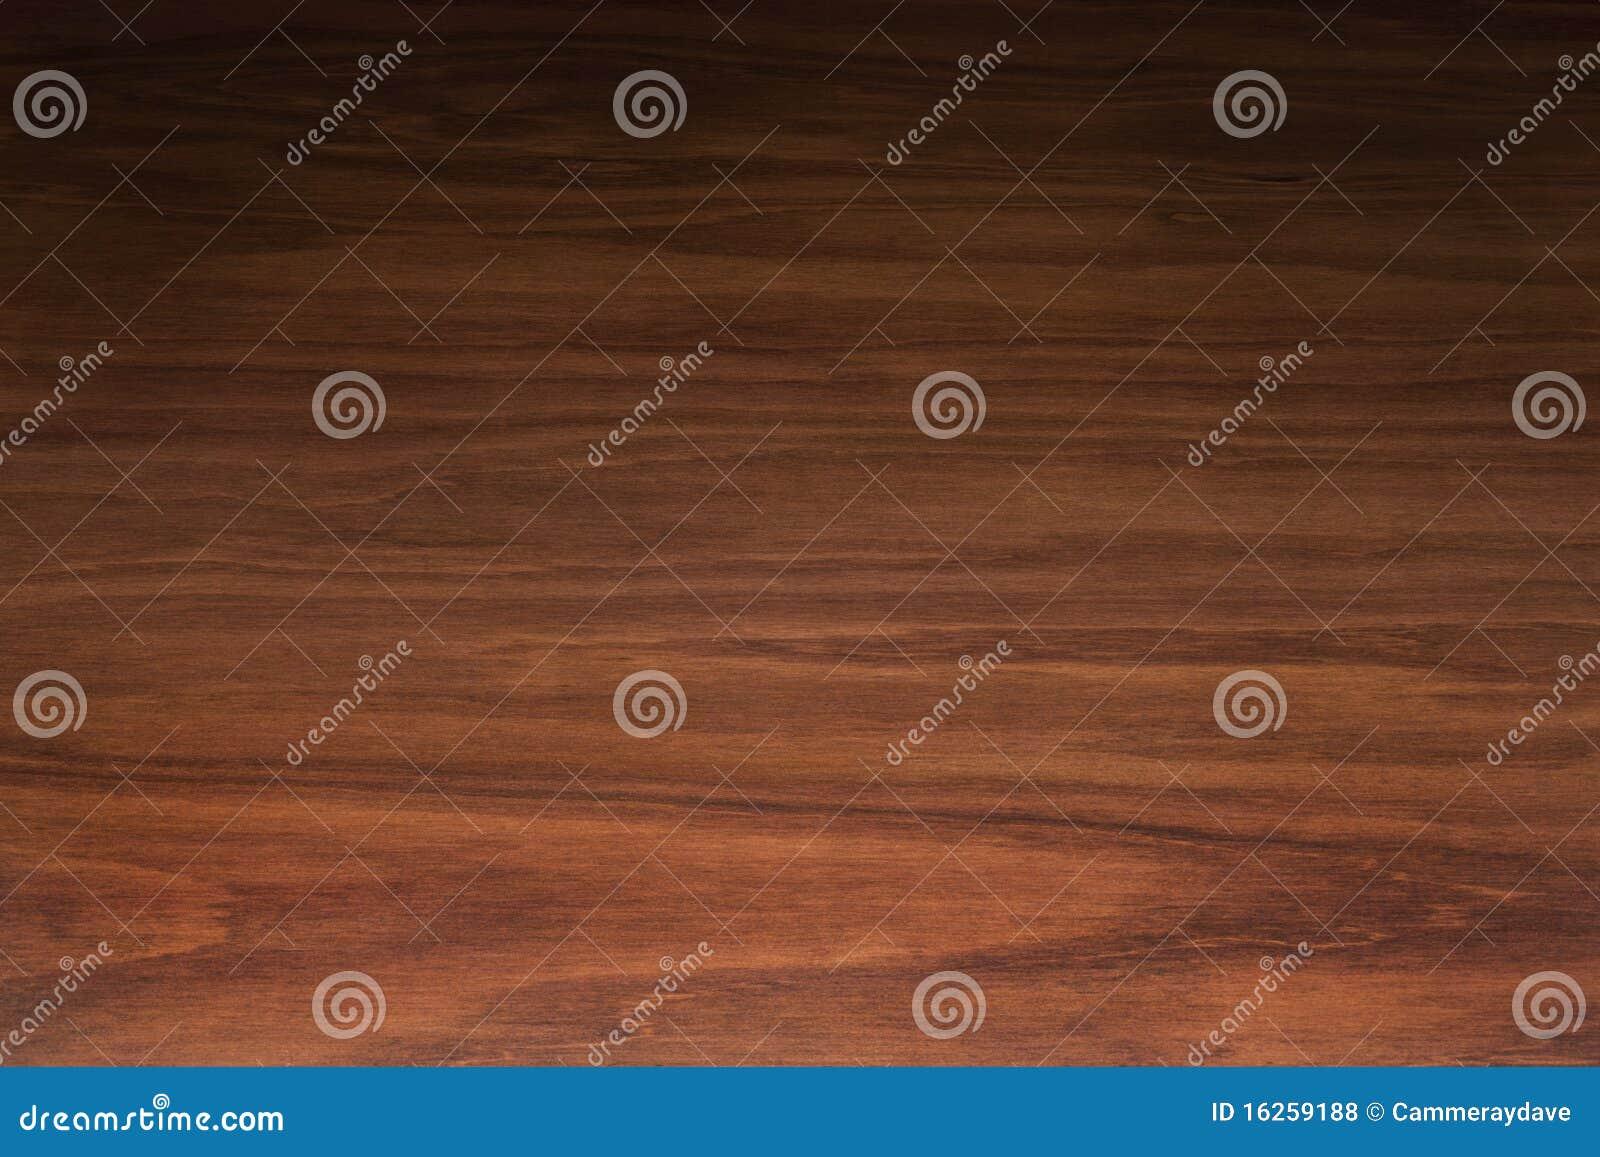 Fondo de madera oscuro